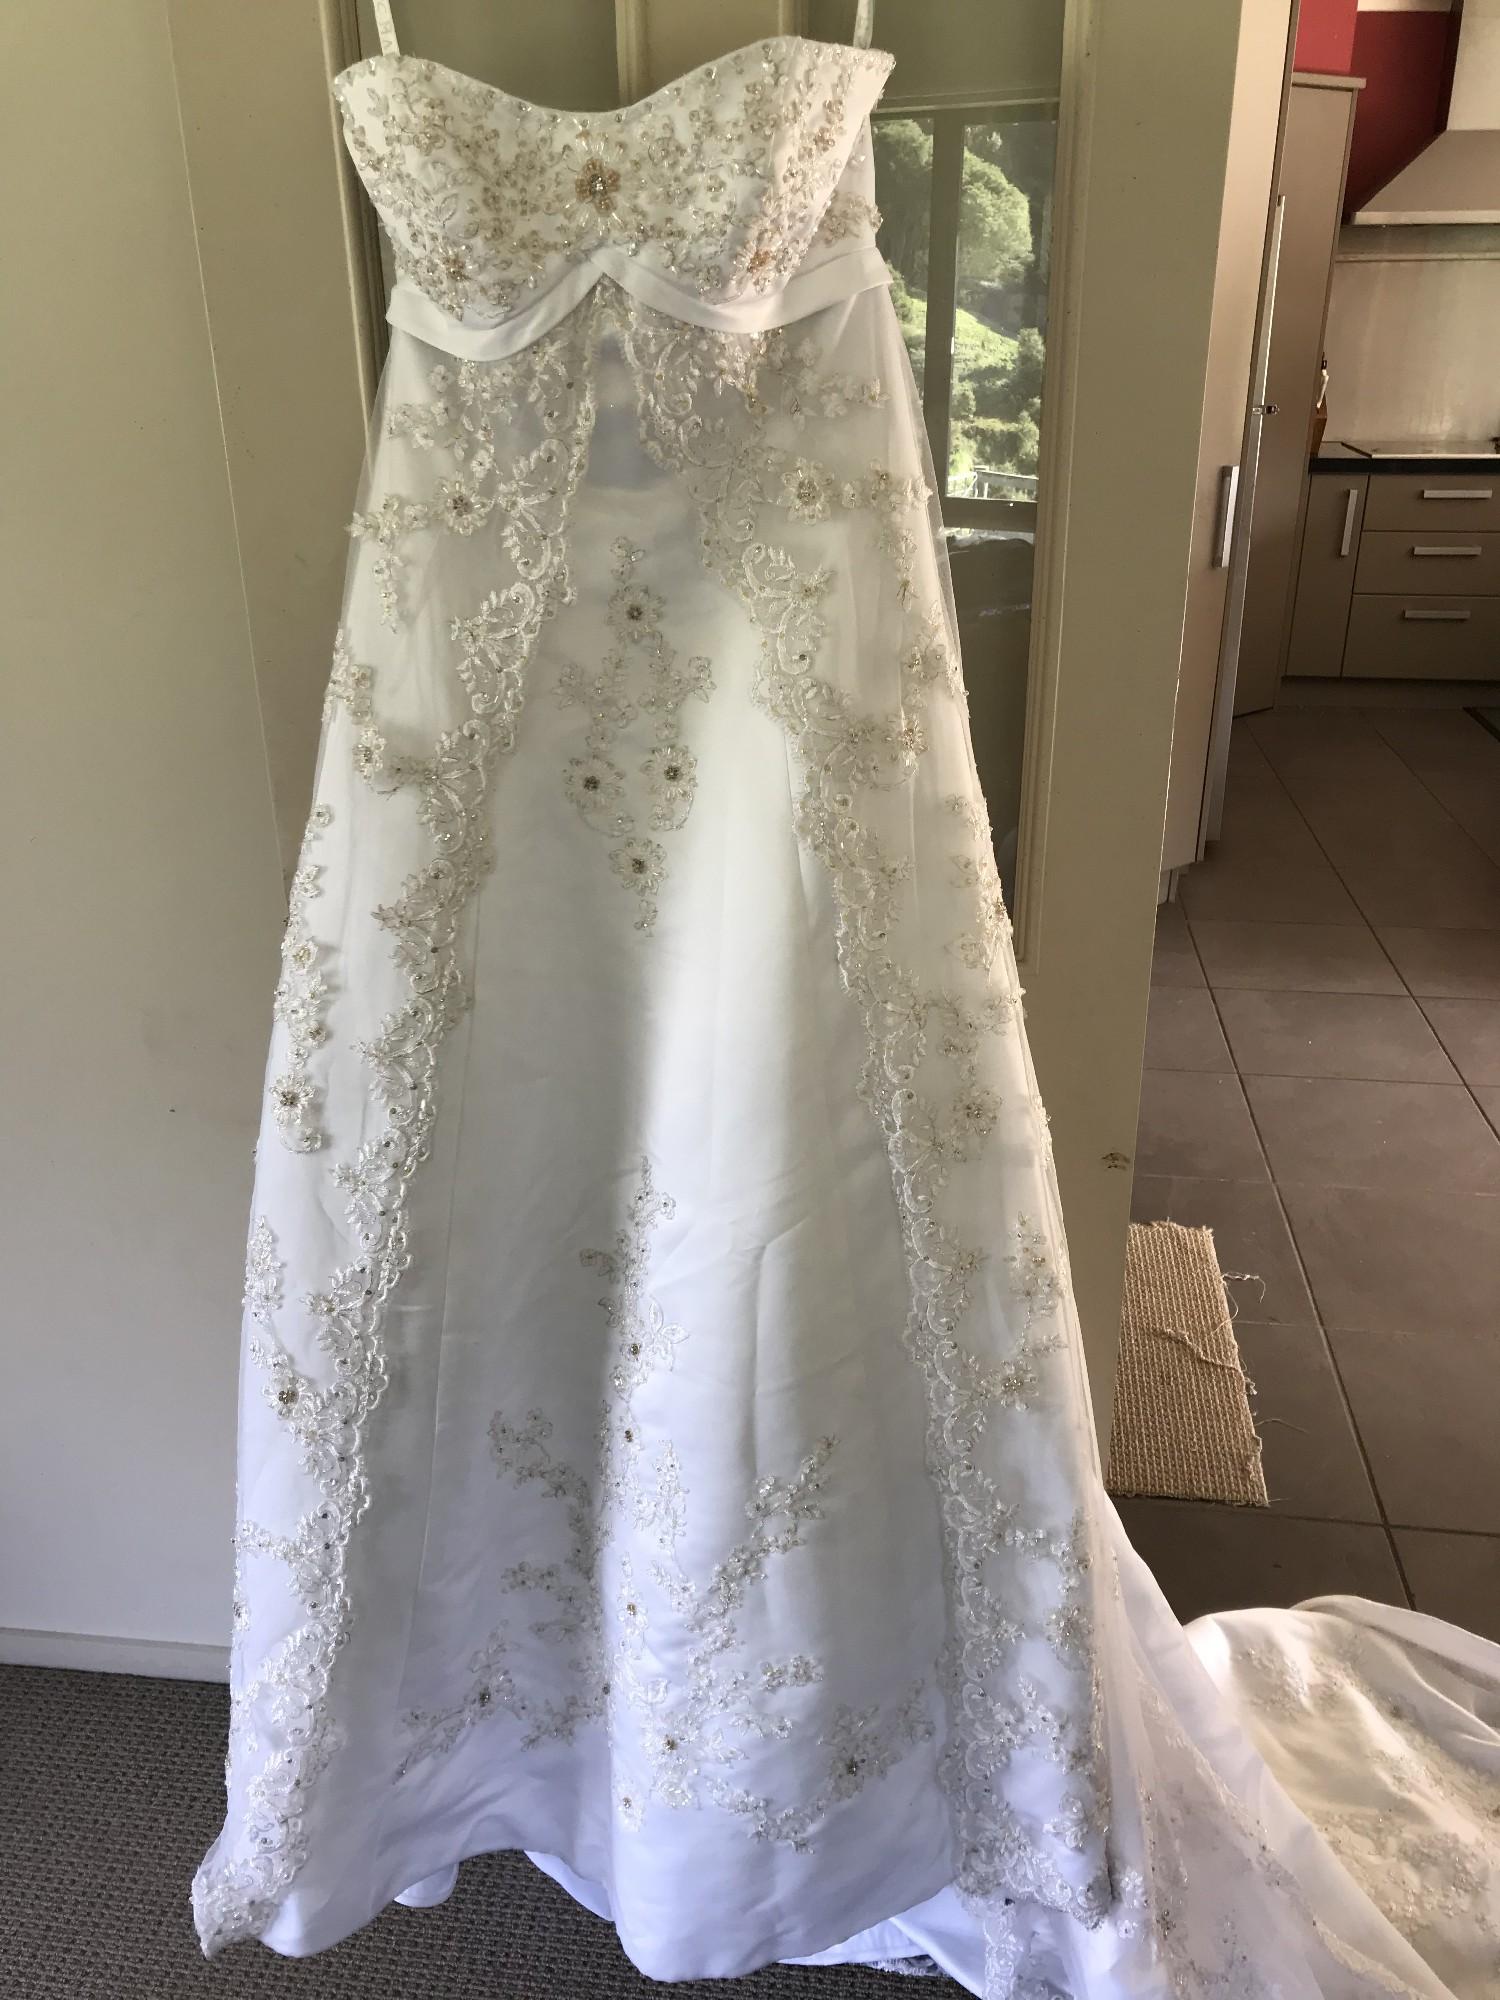 Marys Bridal 5703 Preowned Wedding Dress Save 90%  Stillwhite